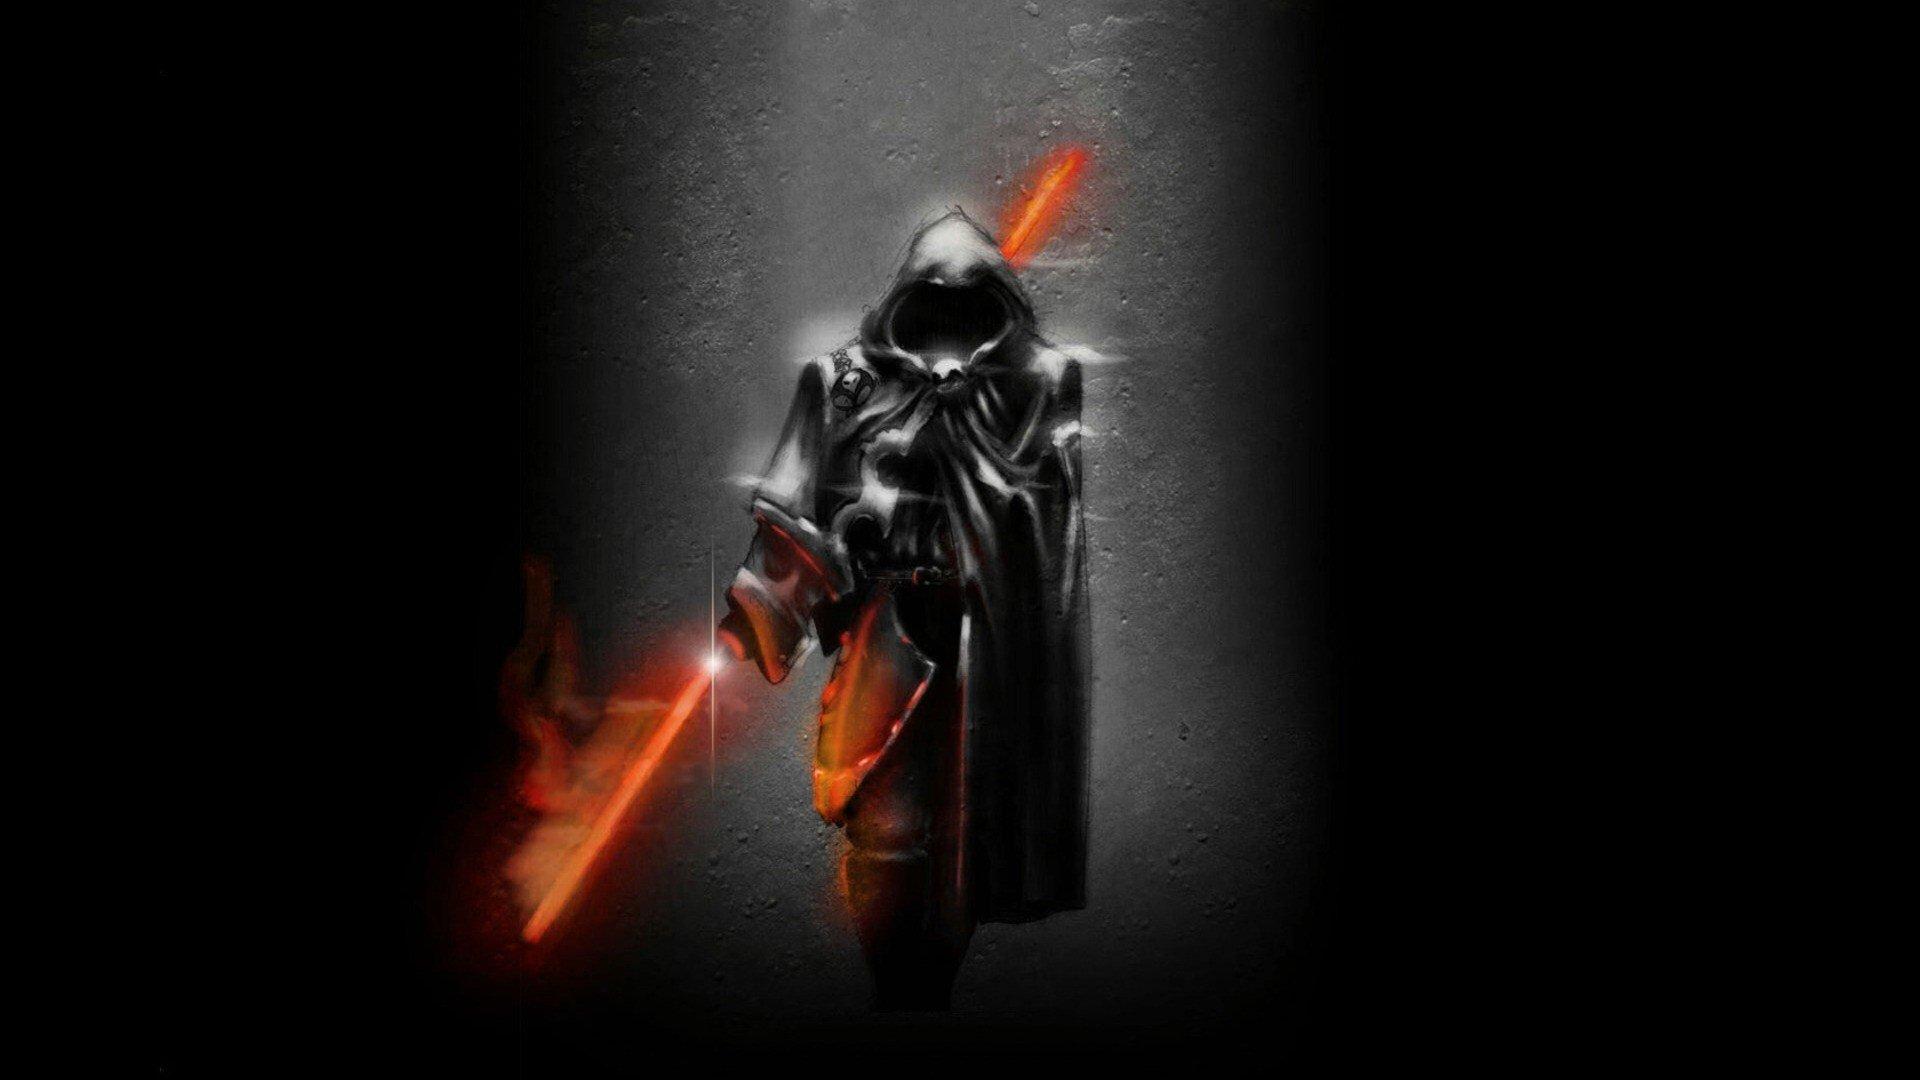 black men digital art artwork warriors dark art light sabers